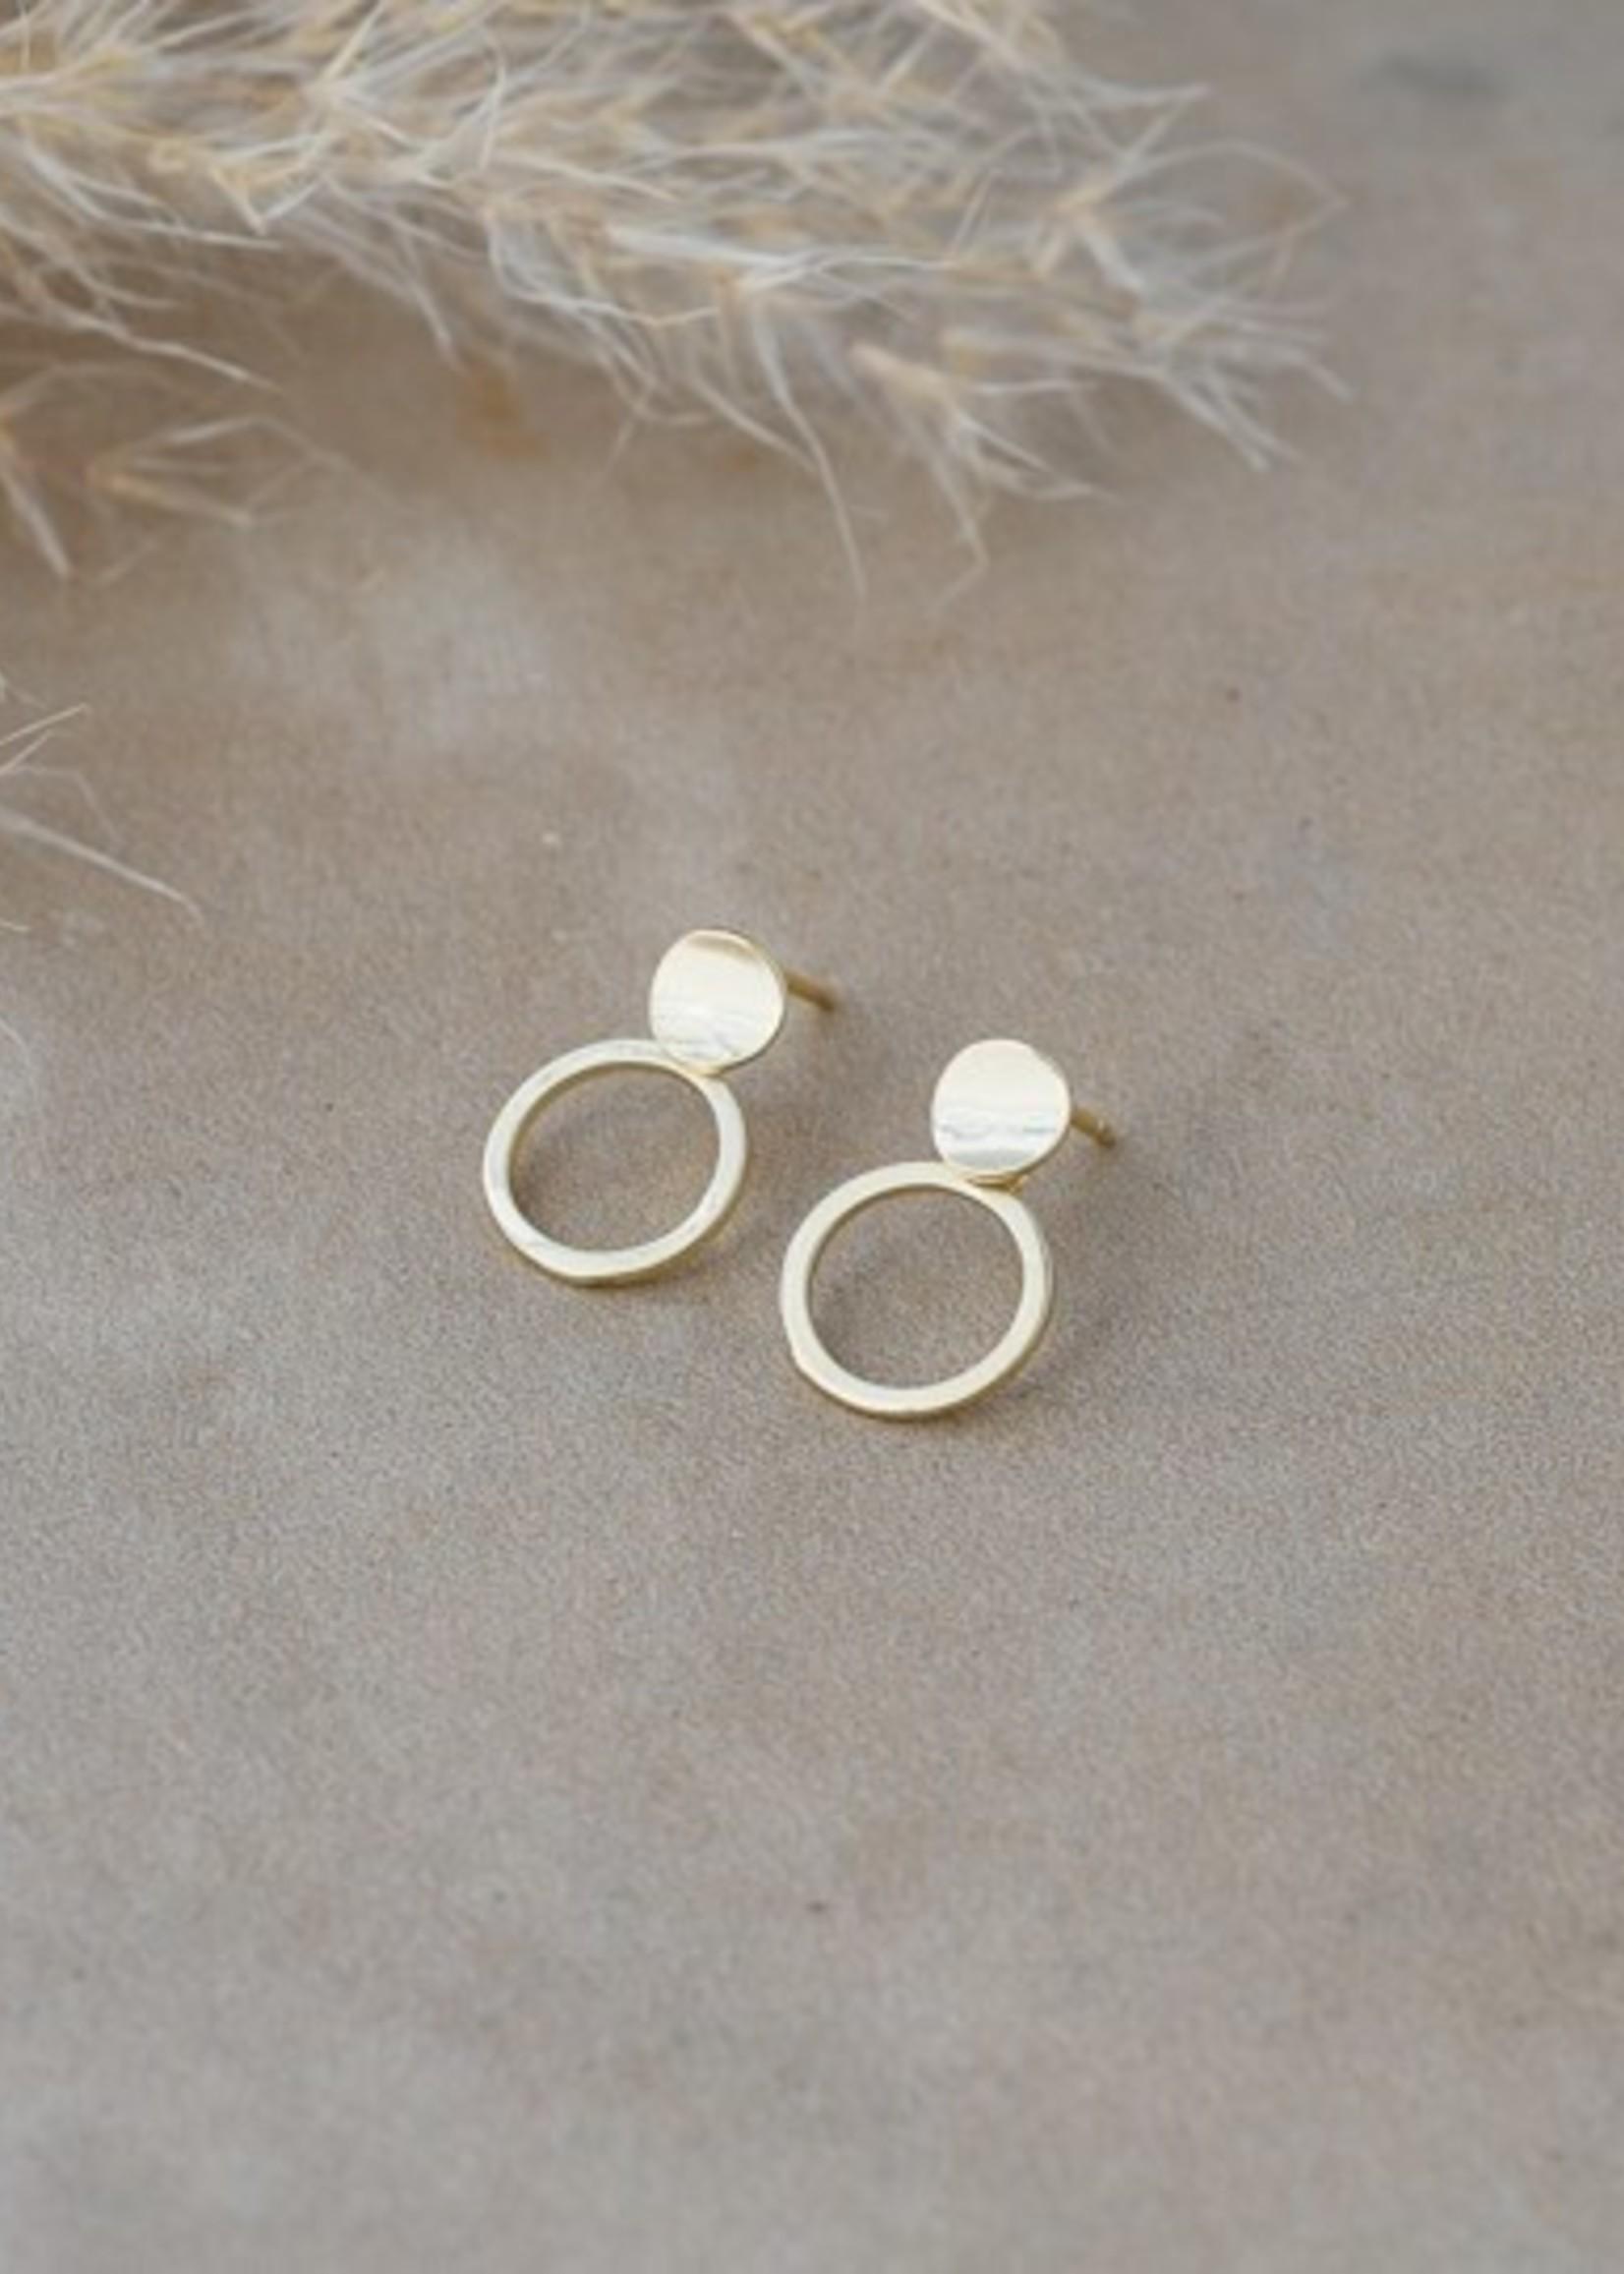 Glee Jewelry Shiloh Stud Gold